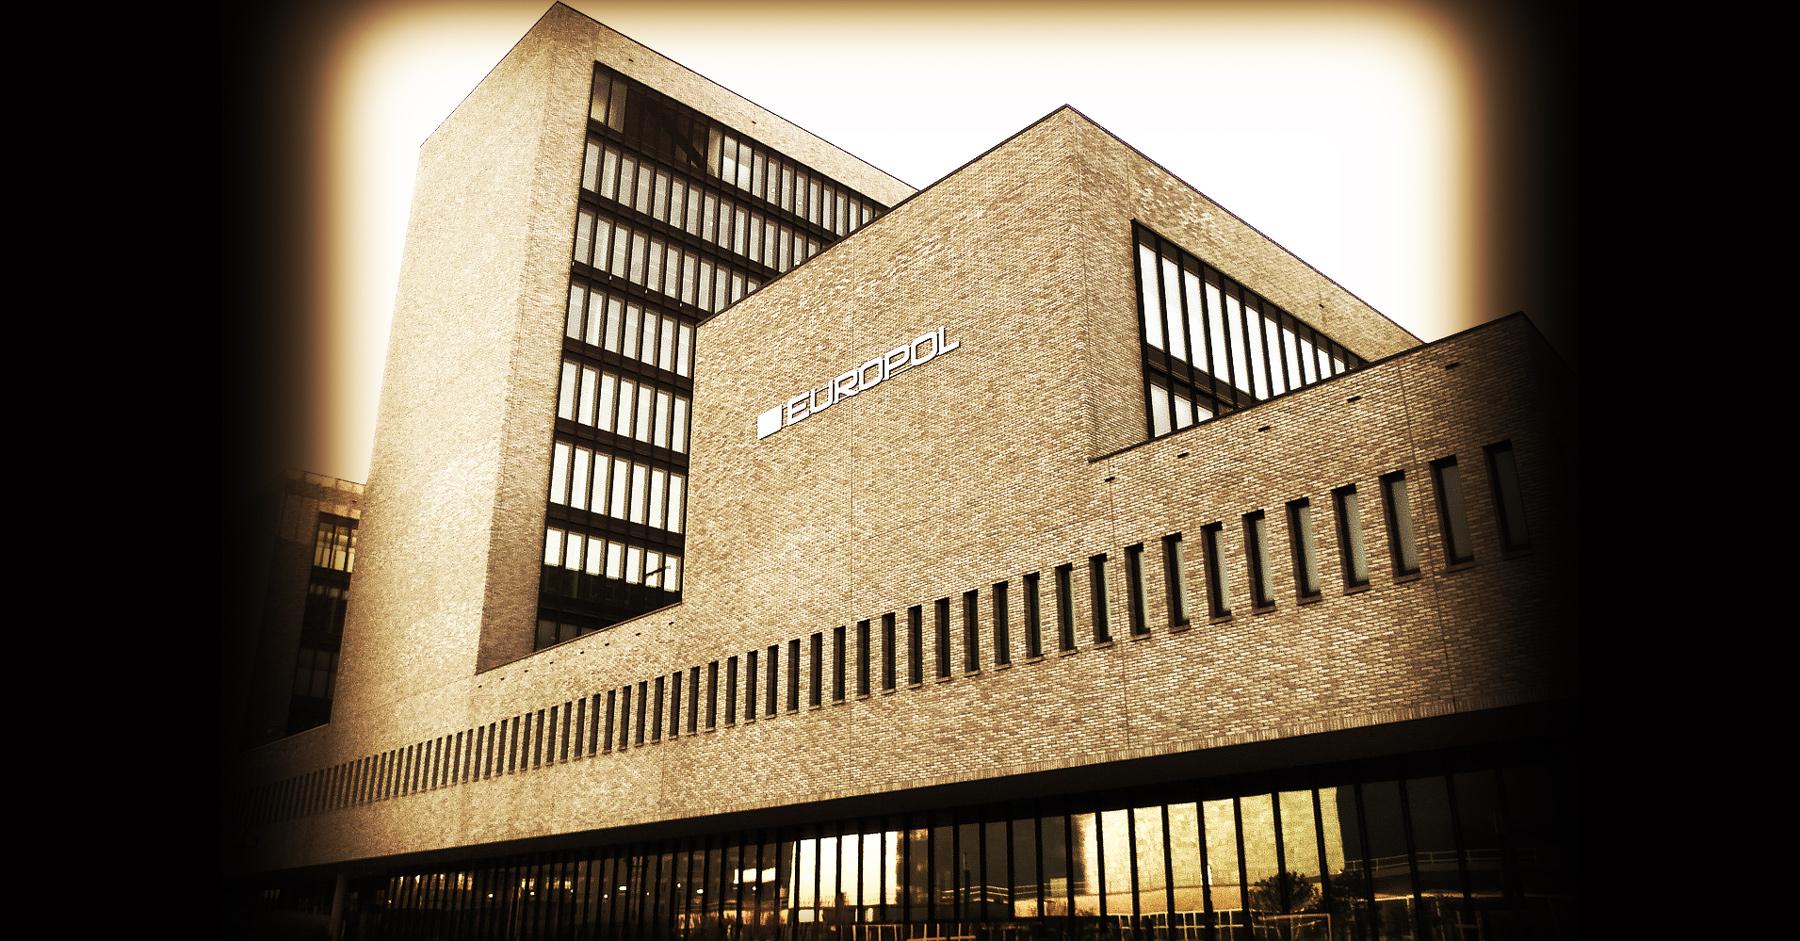 http://justicenow.de/wp-content/uploads/2020/08/Europol_building_The_Hague_the_Netherlands.jpg